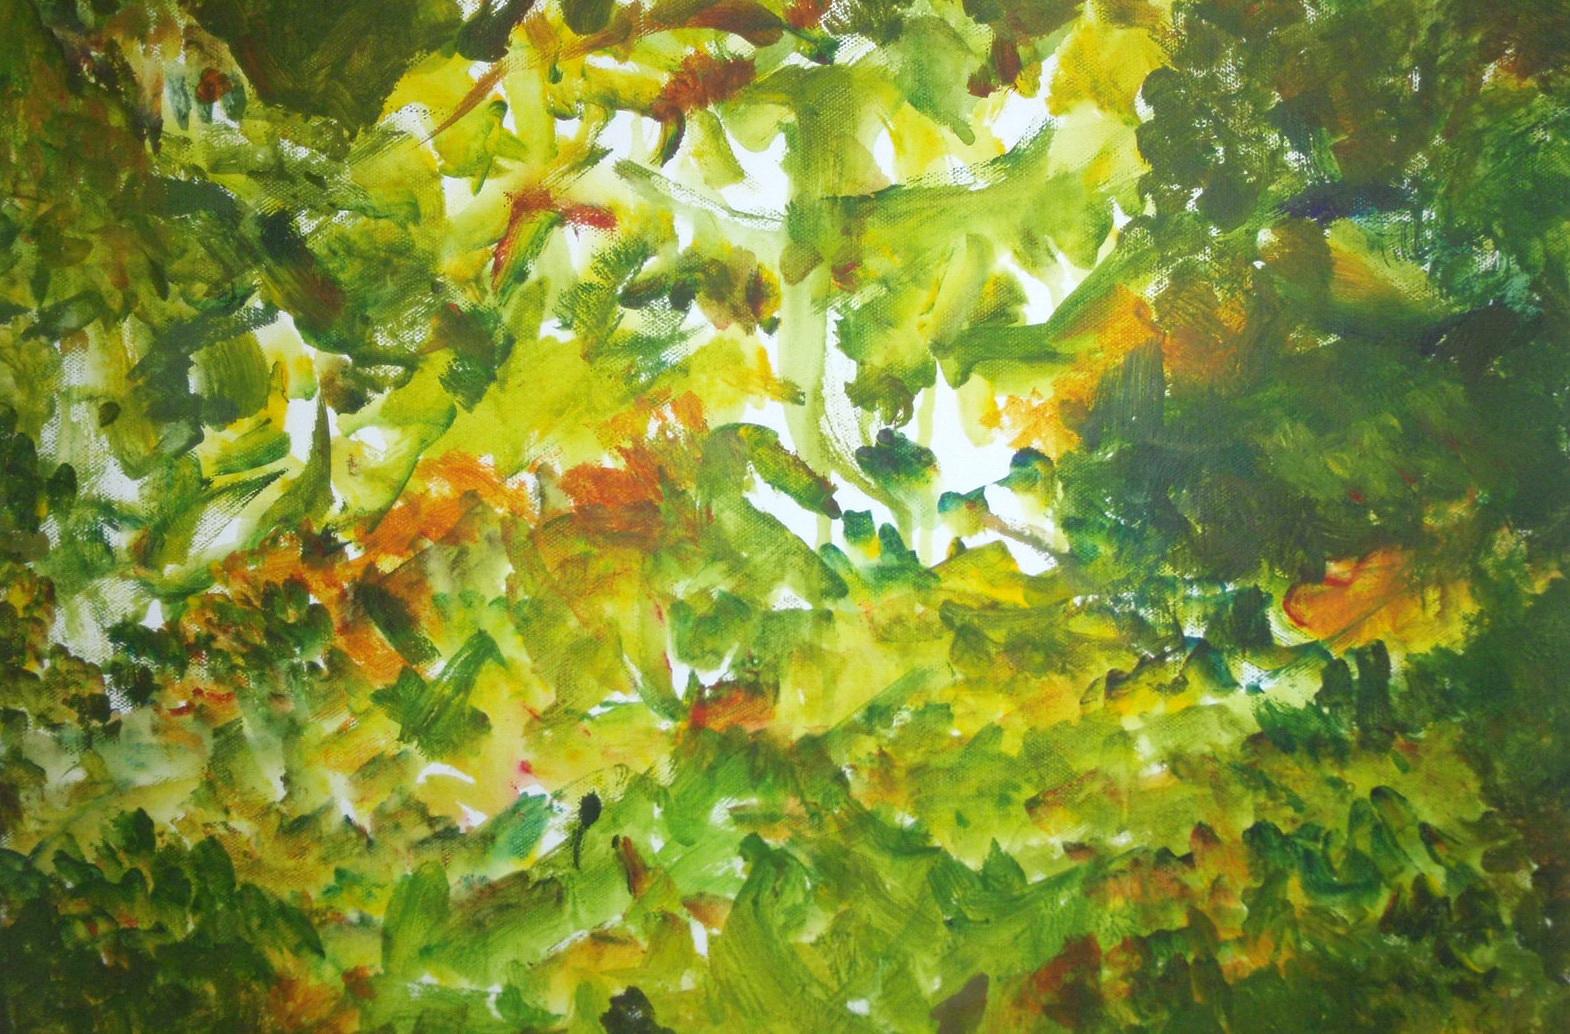 Painting by Tiffany Dawe